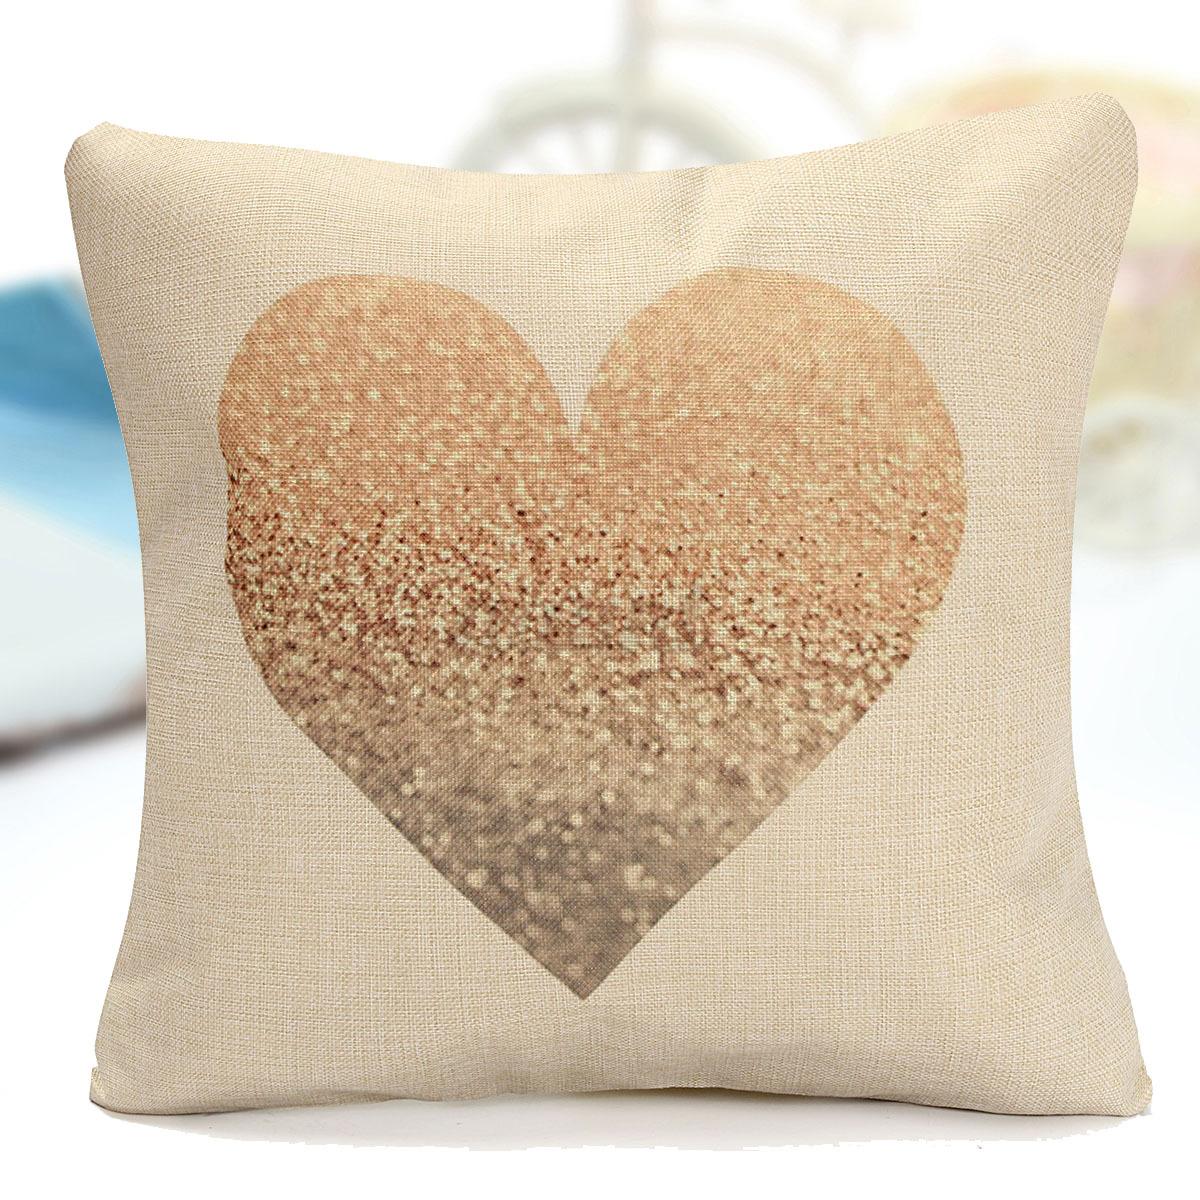 Vintage Love Heart Cotton Linen Cushion Cover Throw Pillow  : 7AD7161657E68B92C79916CCC95603C6CDD2509A039B56D2CB9BCF56C7D29E439C93D29EA9369973CE16CAC6261A9B9D9EF553 from www.ebay.com size 1200 x 1200 jpeg 479kB